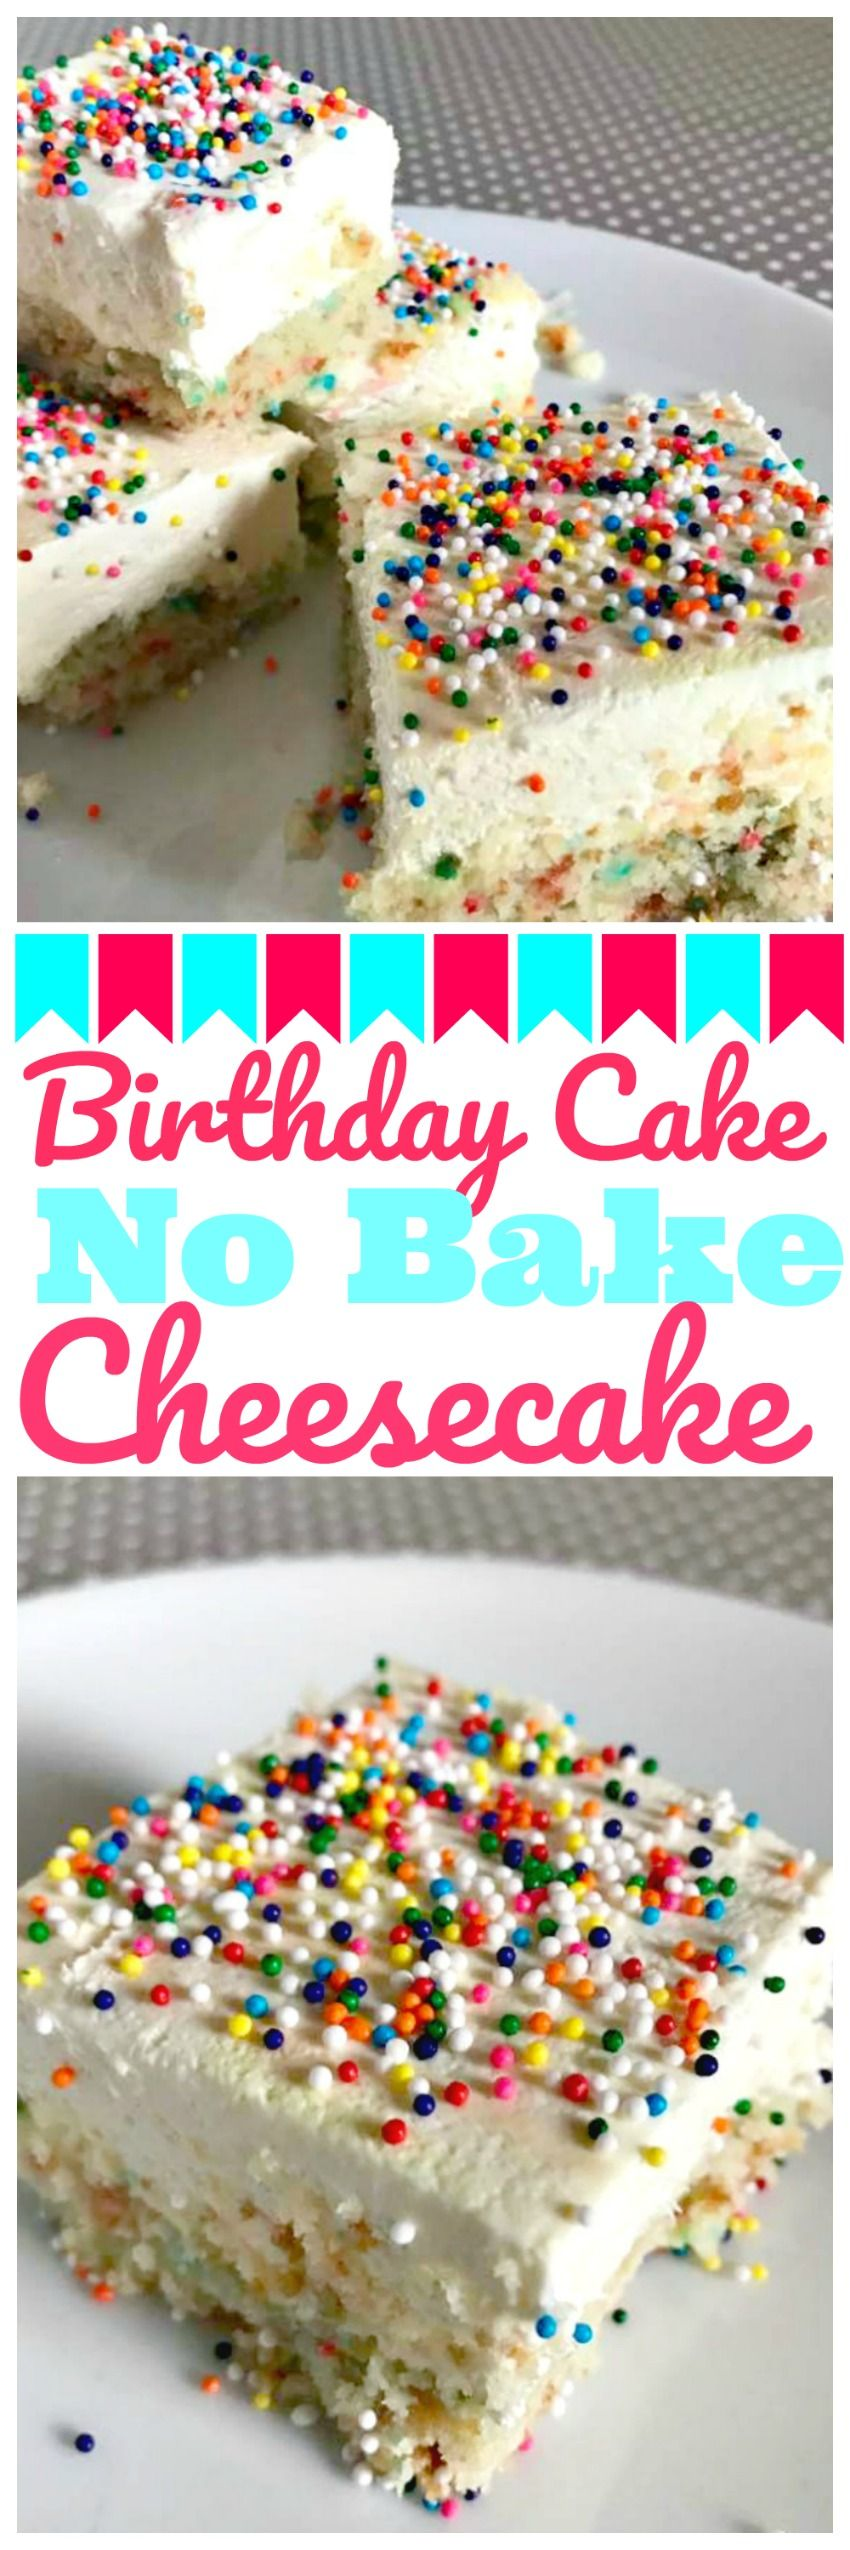 Birthday Cake No Bake Cheesecake Bars Potlucks Birthday cakes and